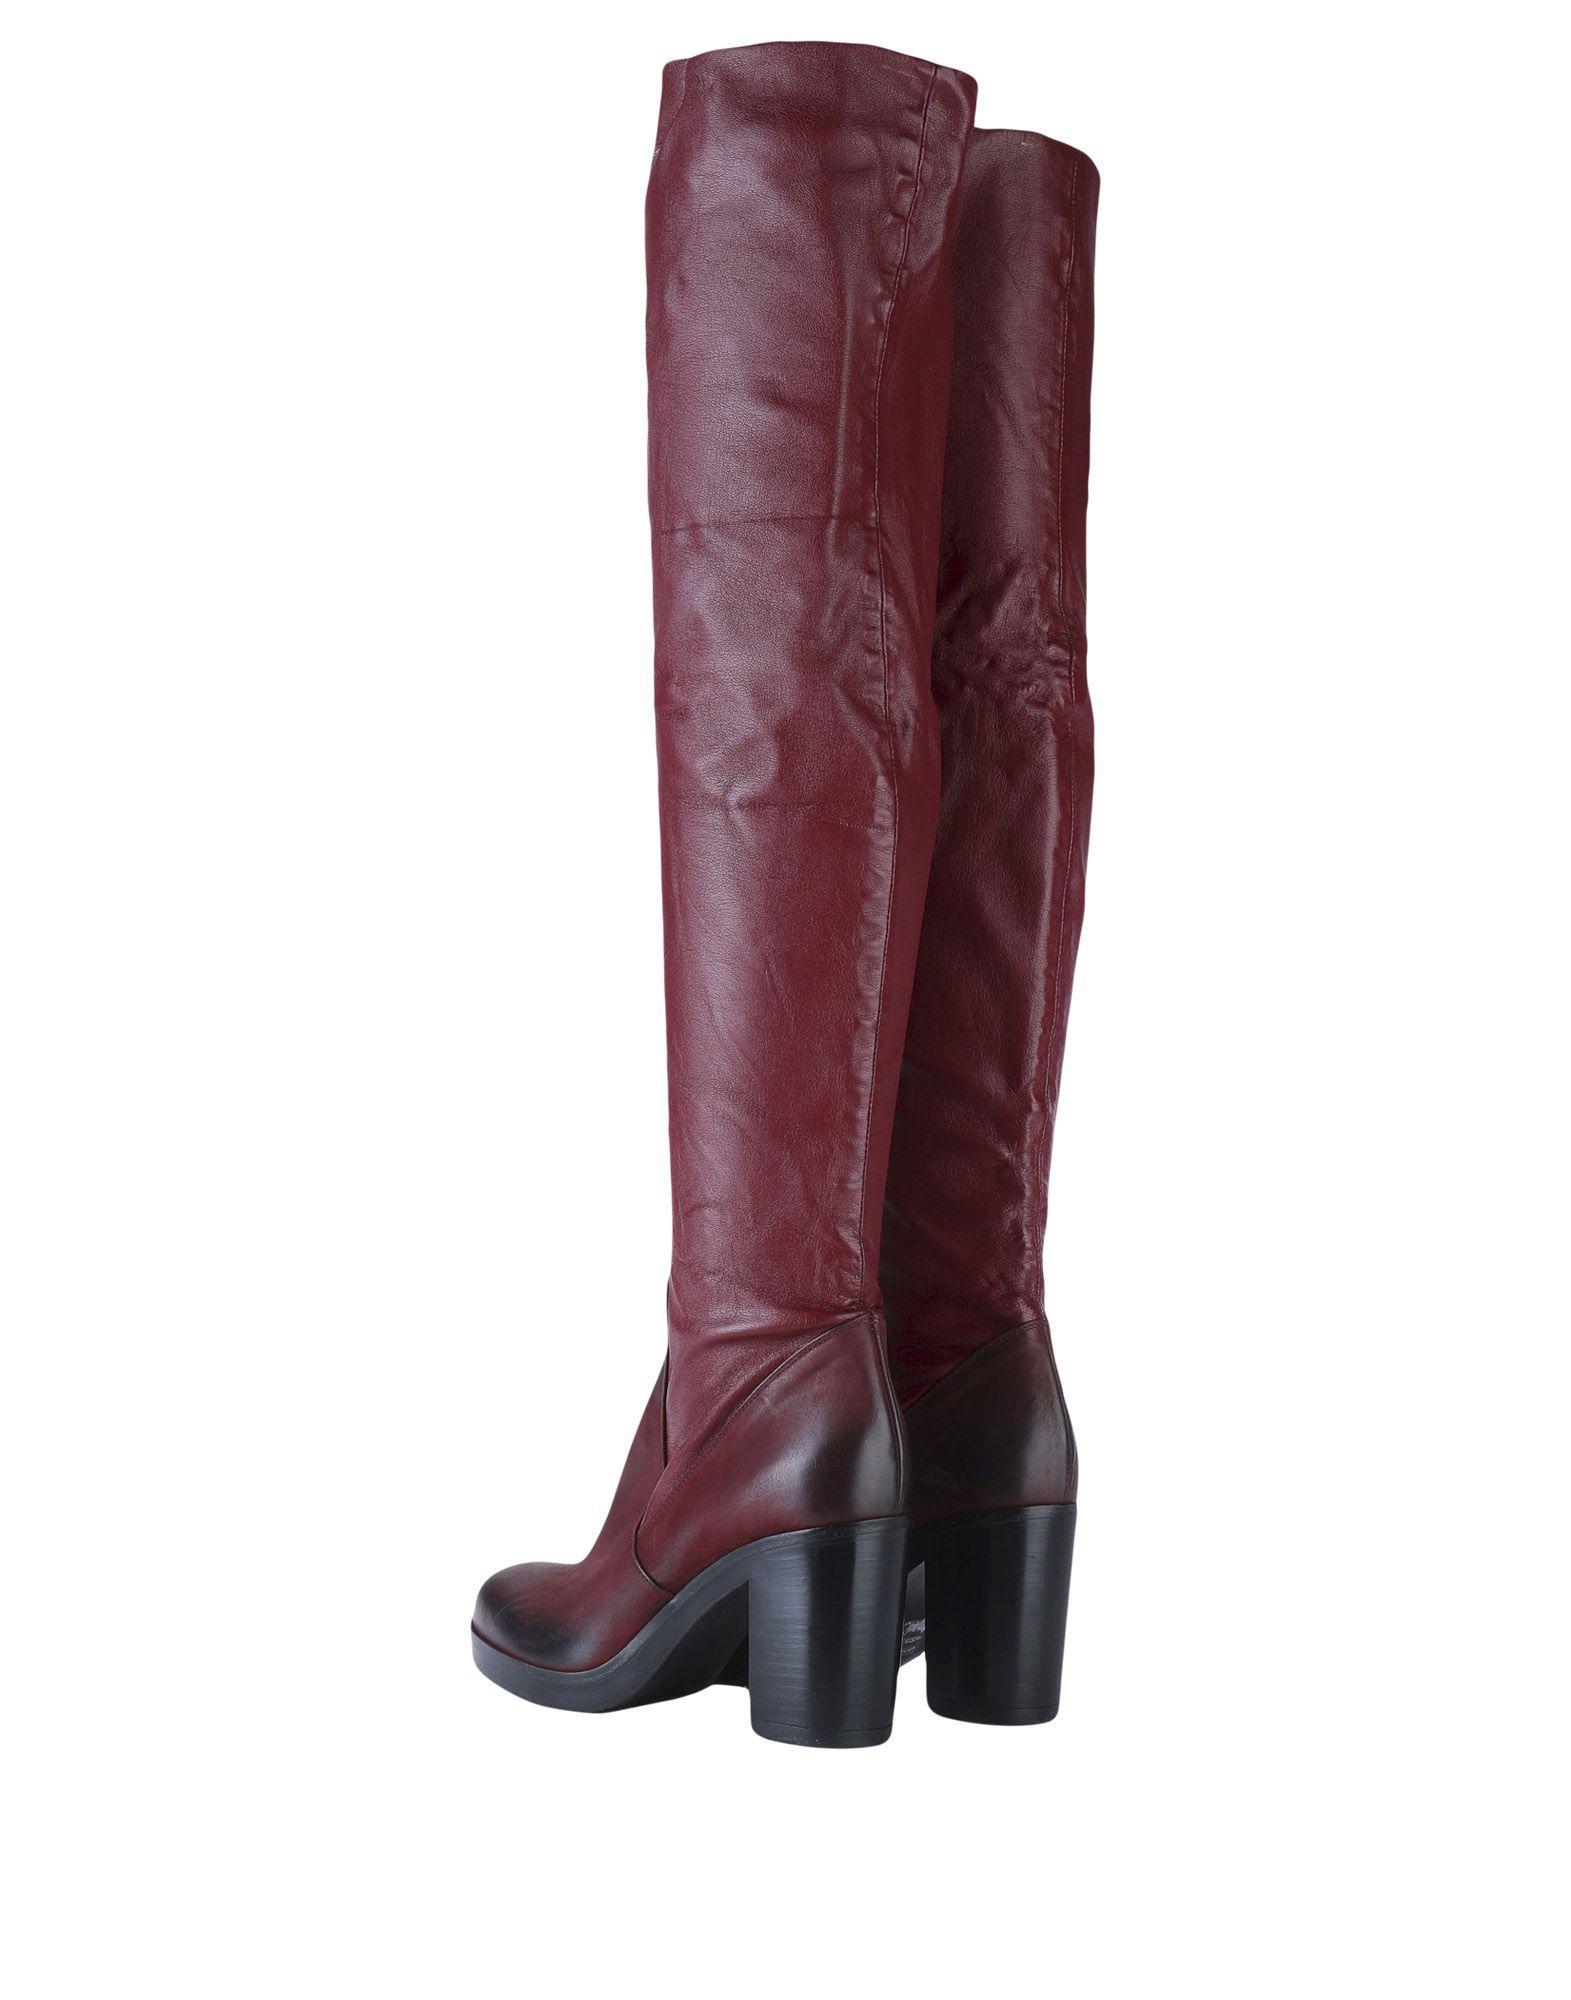 Stilvolle billige  Schuhe Jfk Stiefel Damen  billige 11472472CW 897a20